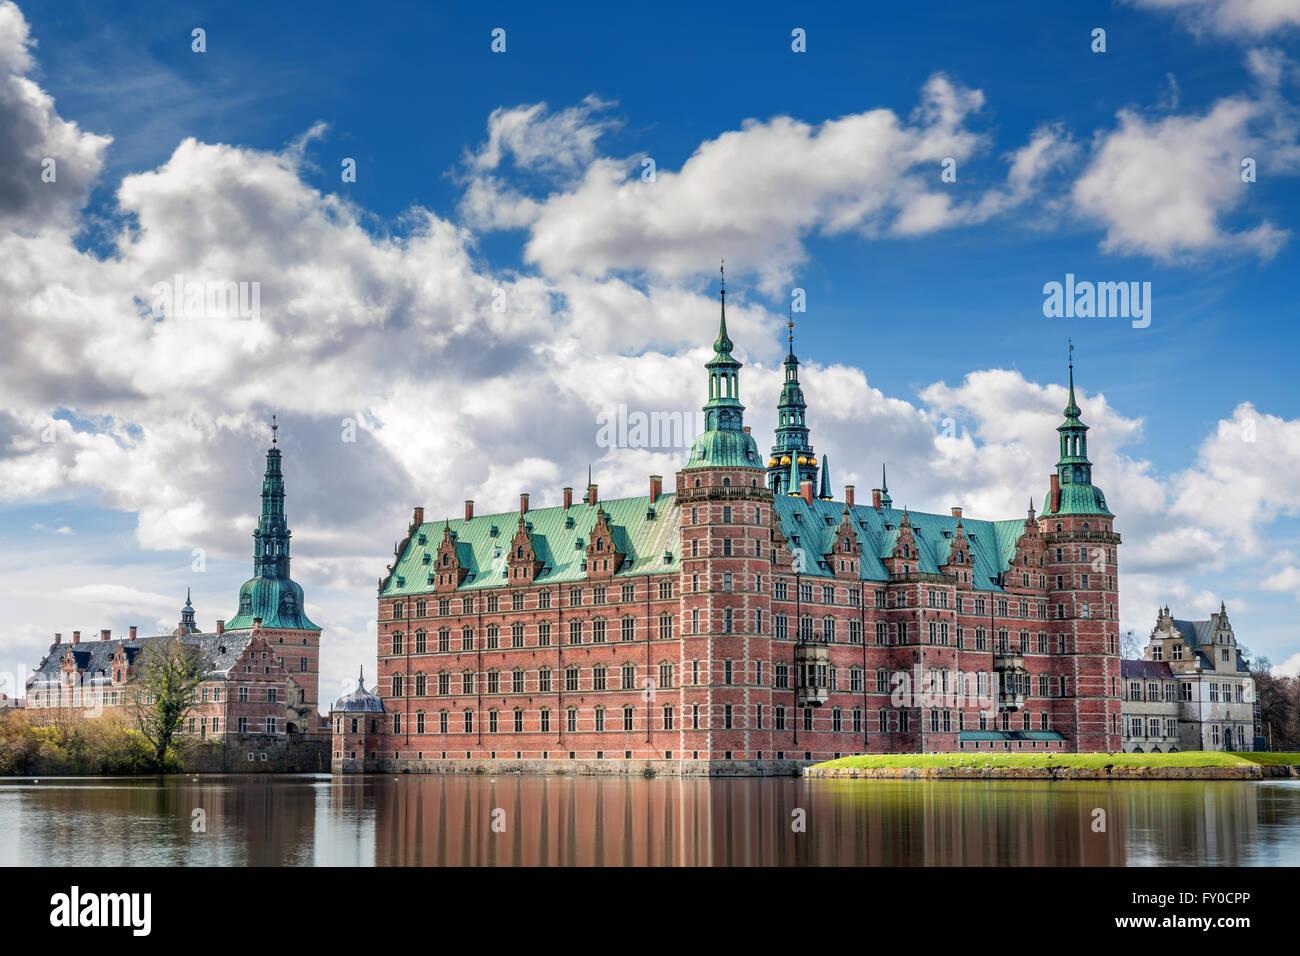 Frederiksborg Castle, Hillerød, Denmark - Stock Image